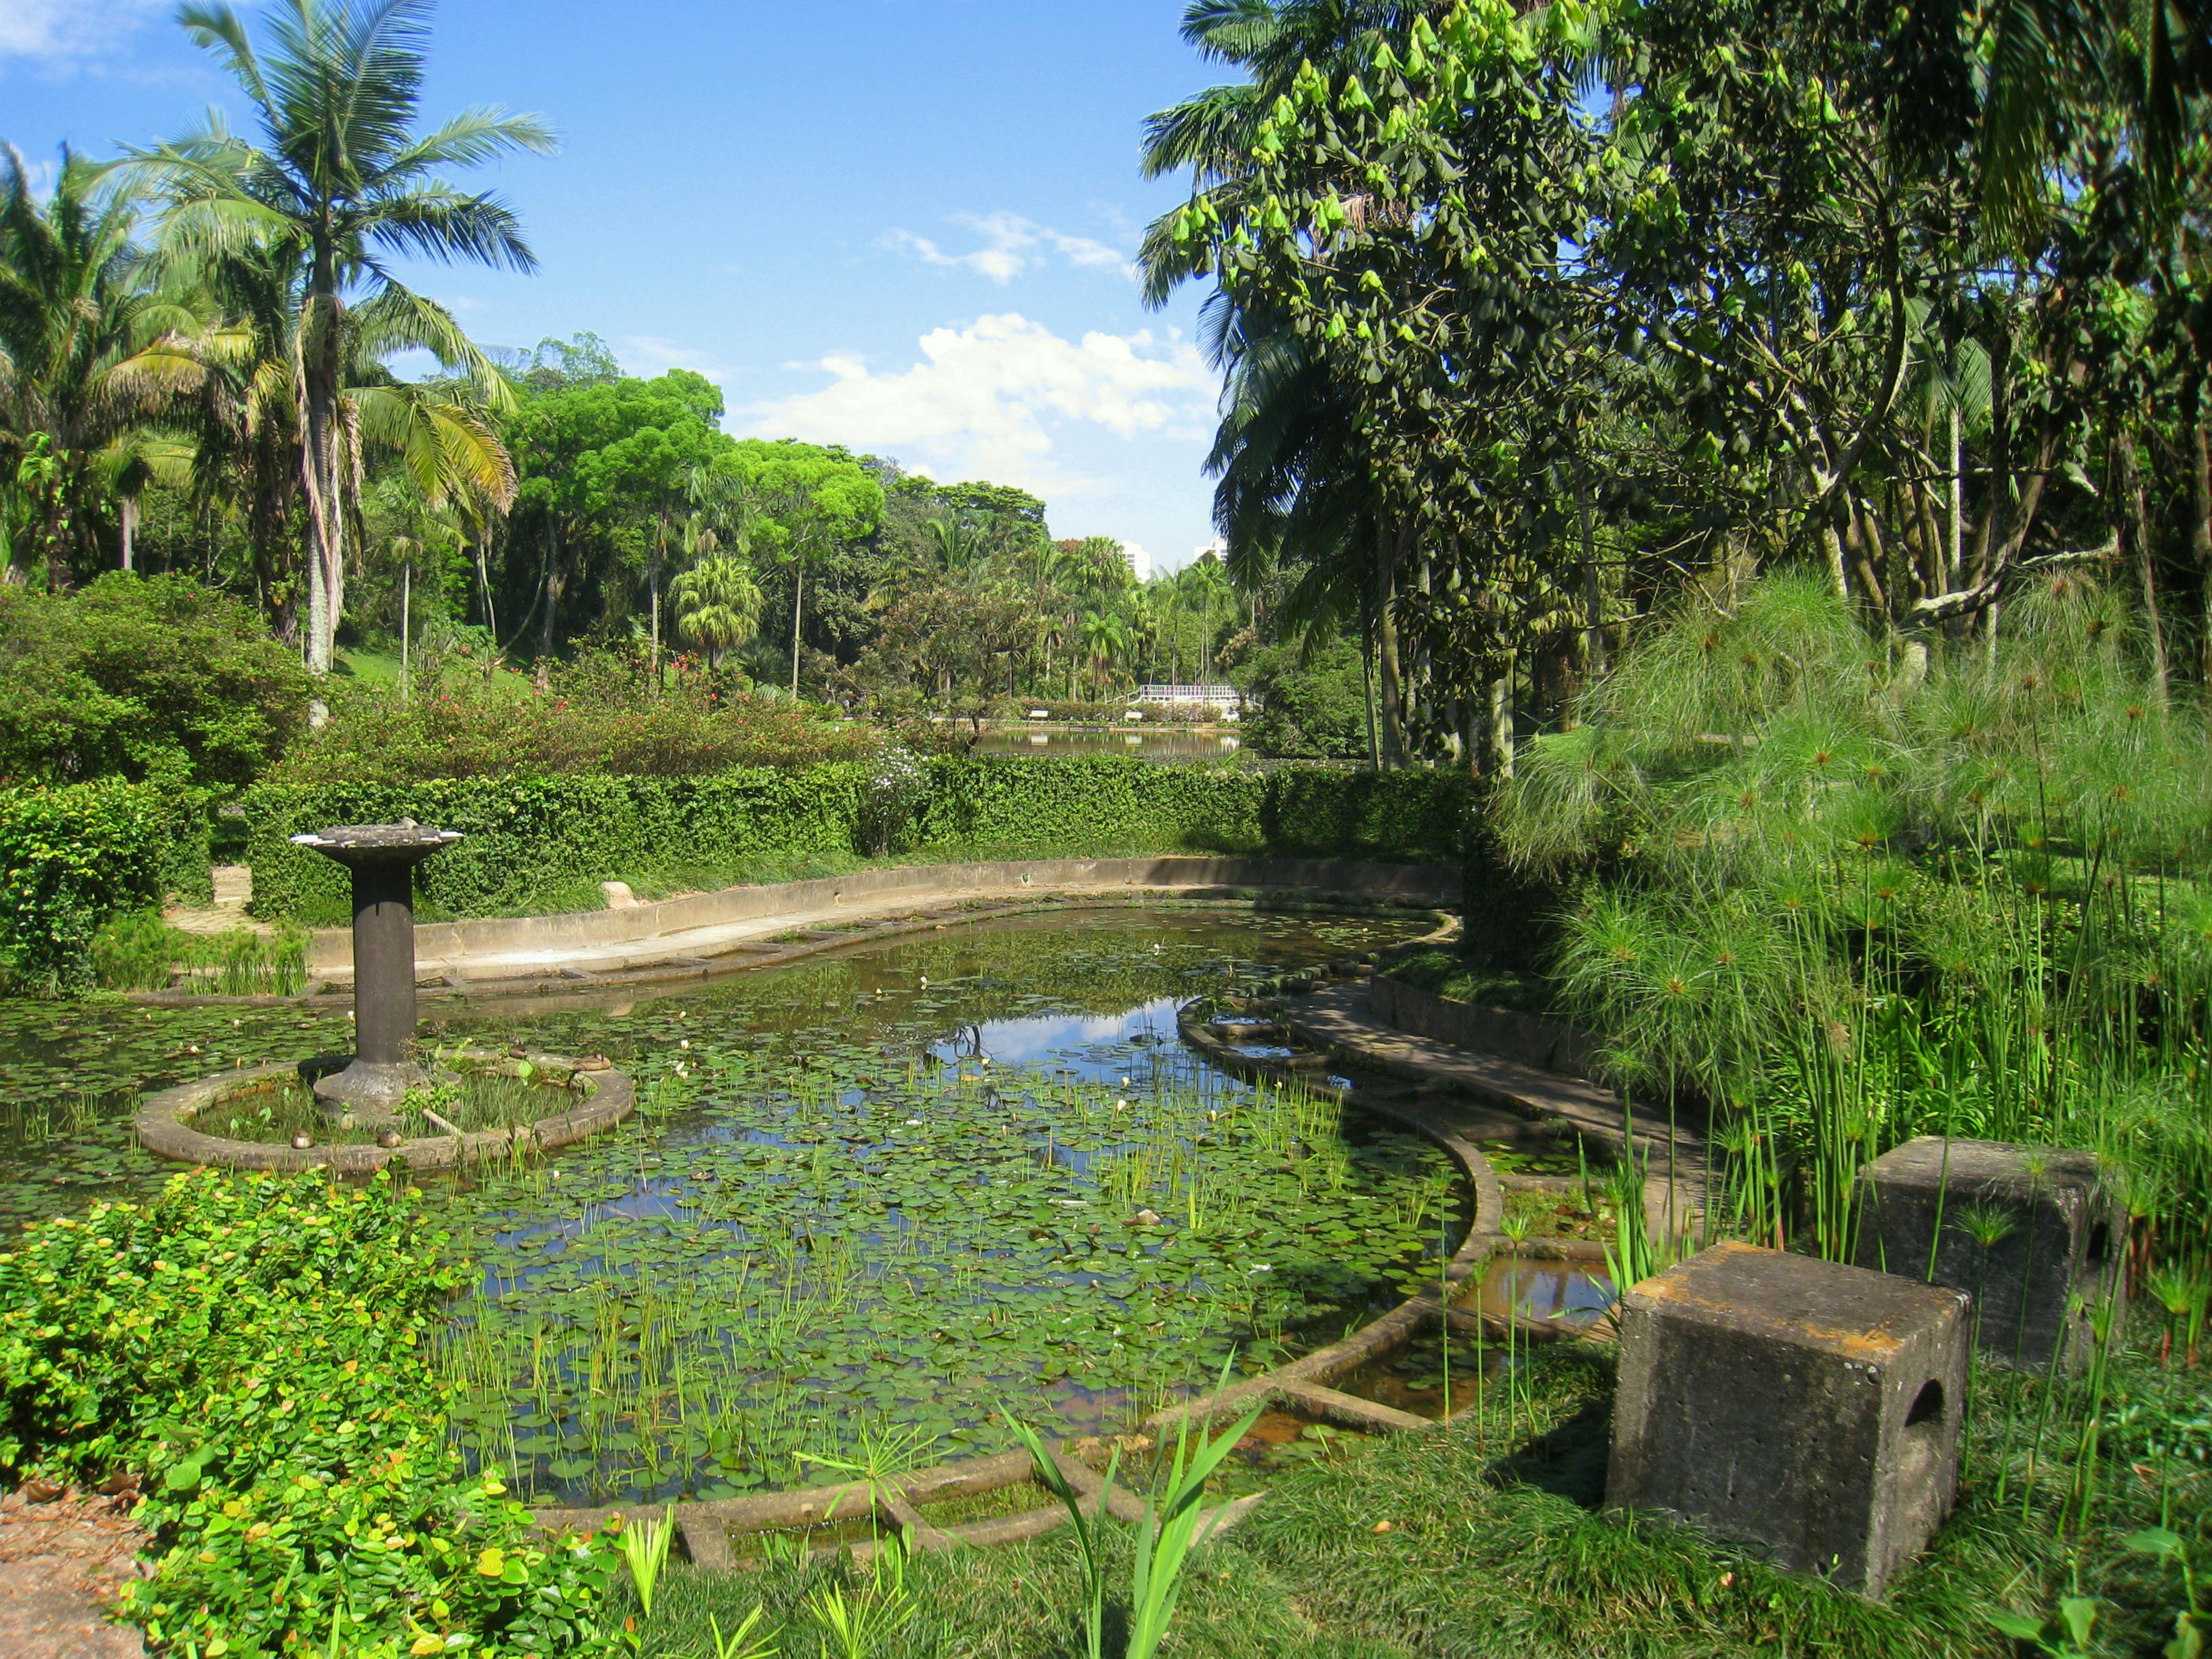 File:Jardim Bot?nico de S?o Paulo - general view IMG 0109 ...